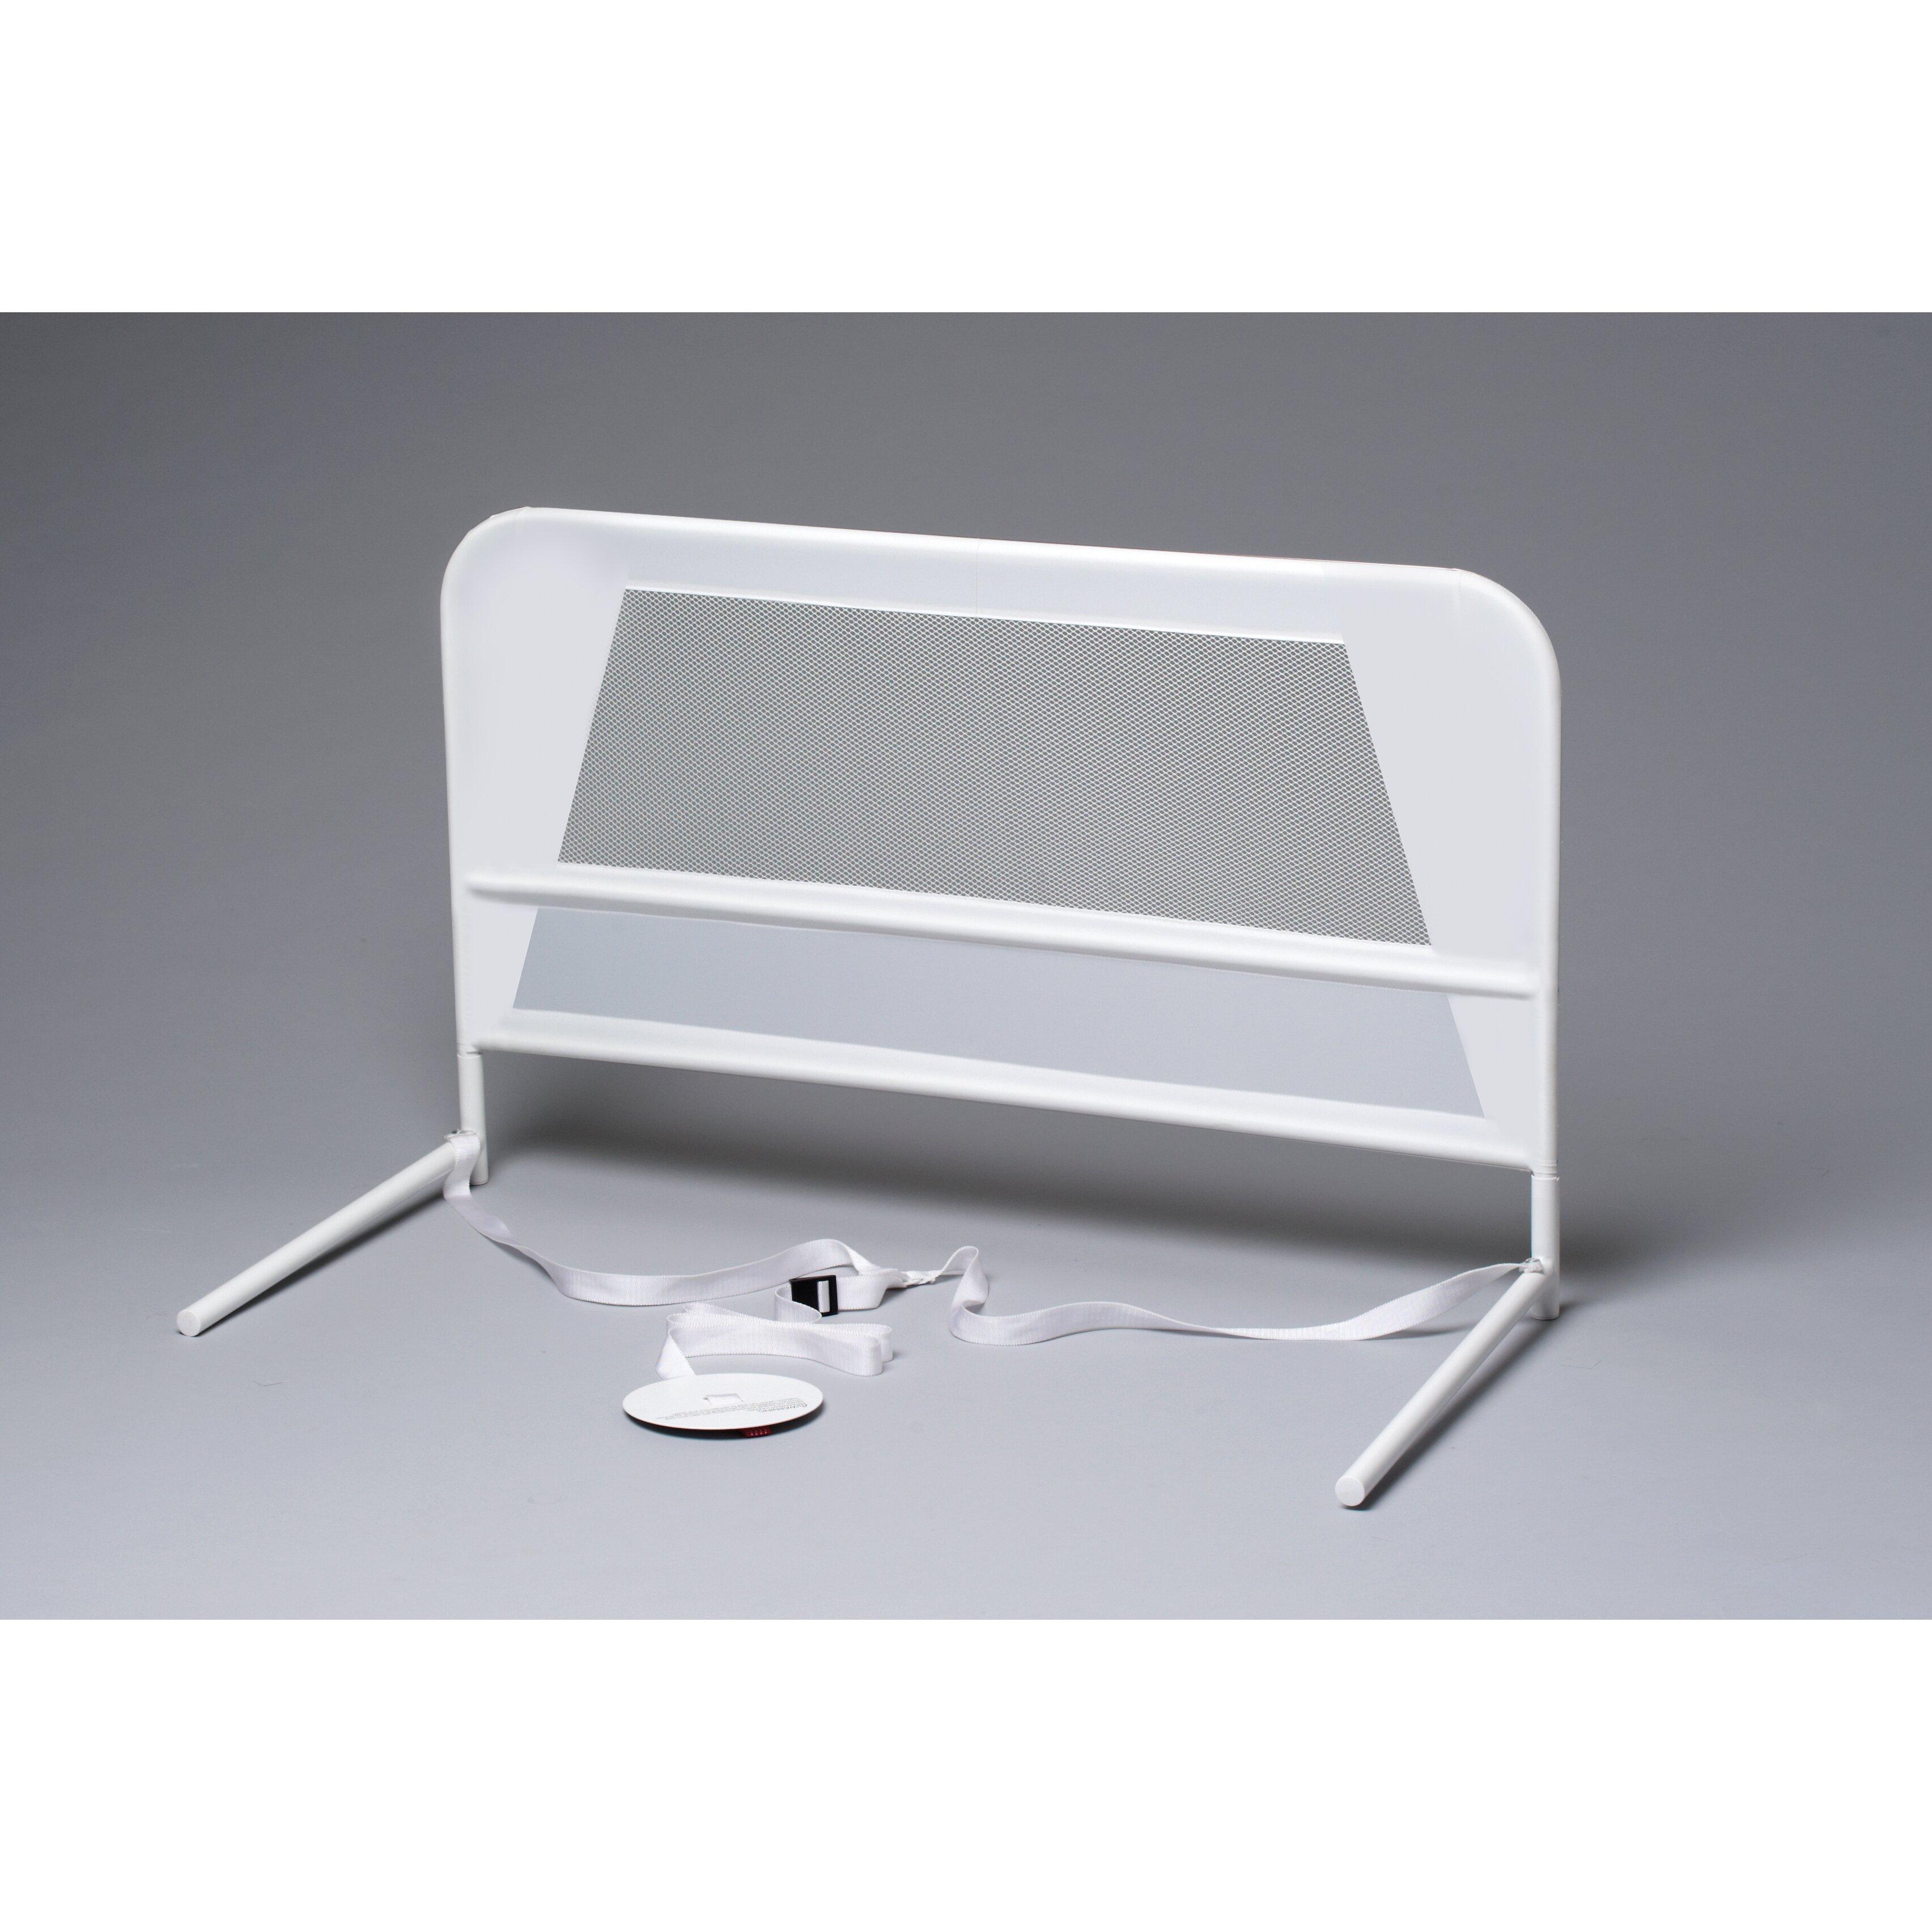 Childrens Mesh Toddler Bed Rail